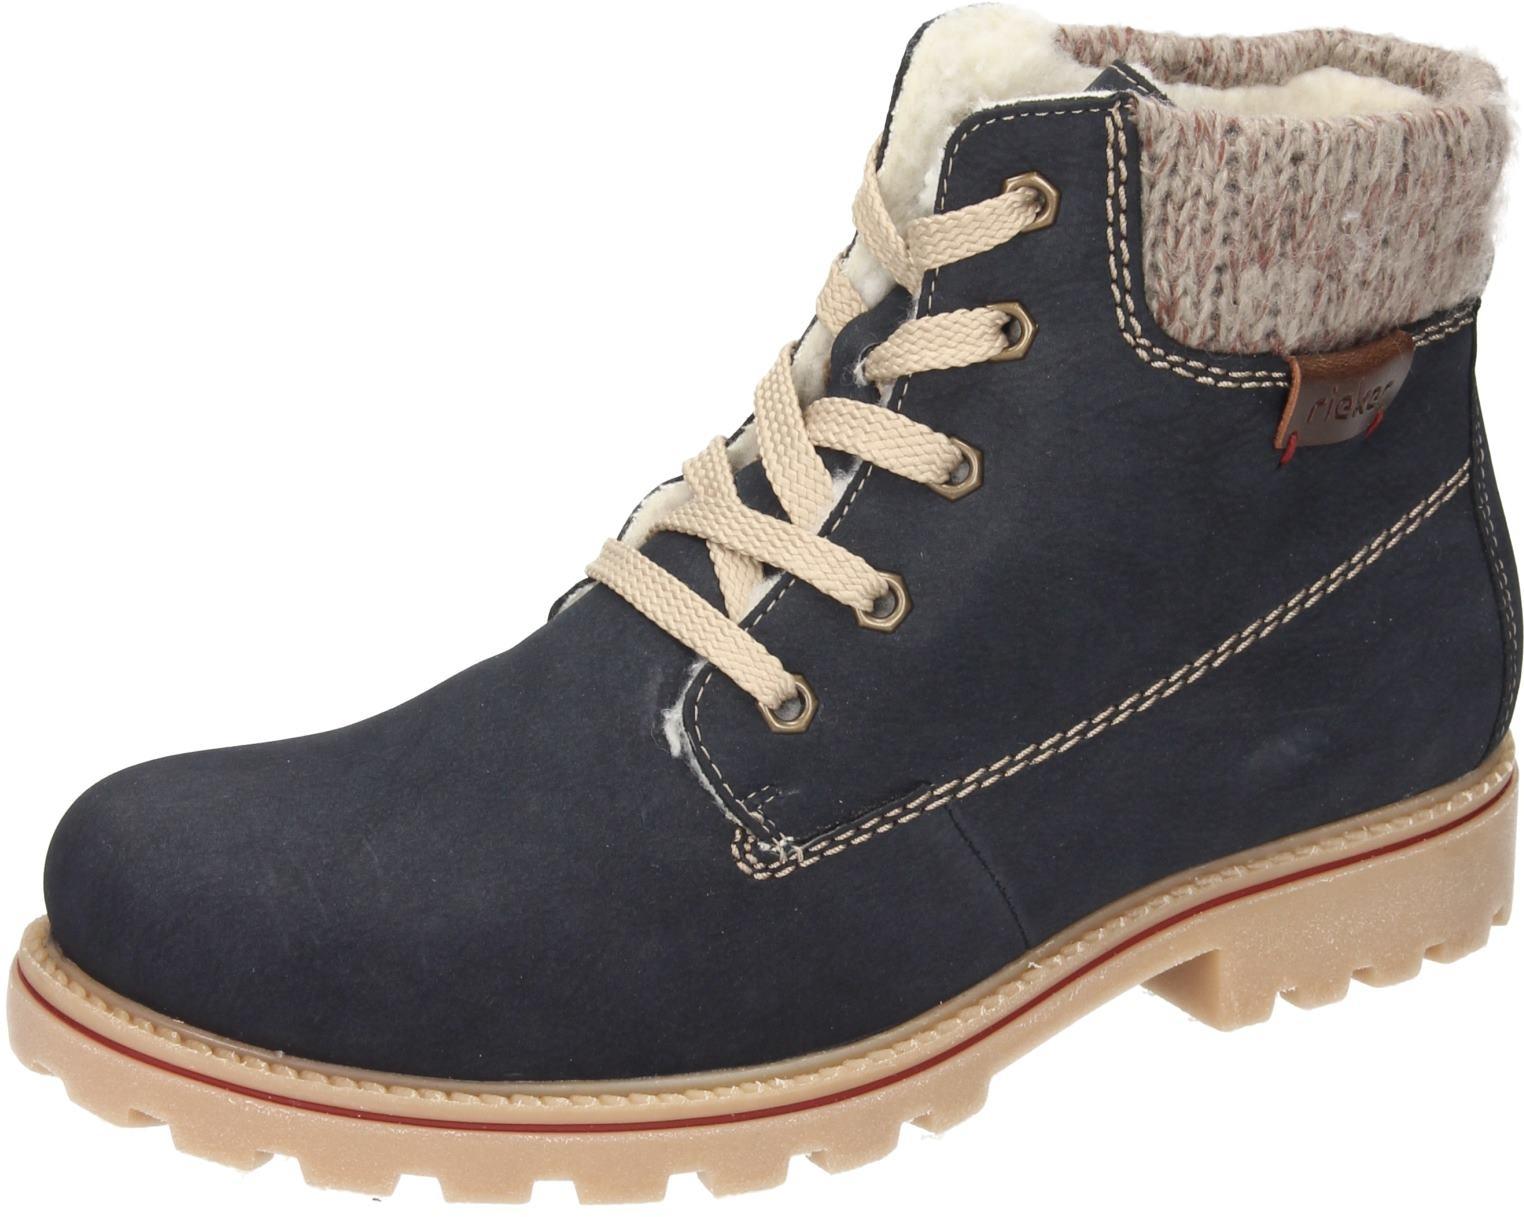 Rieker Damen Schuhe Damen Stiefelette blau Synthetik | eBay 9b2o1